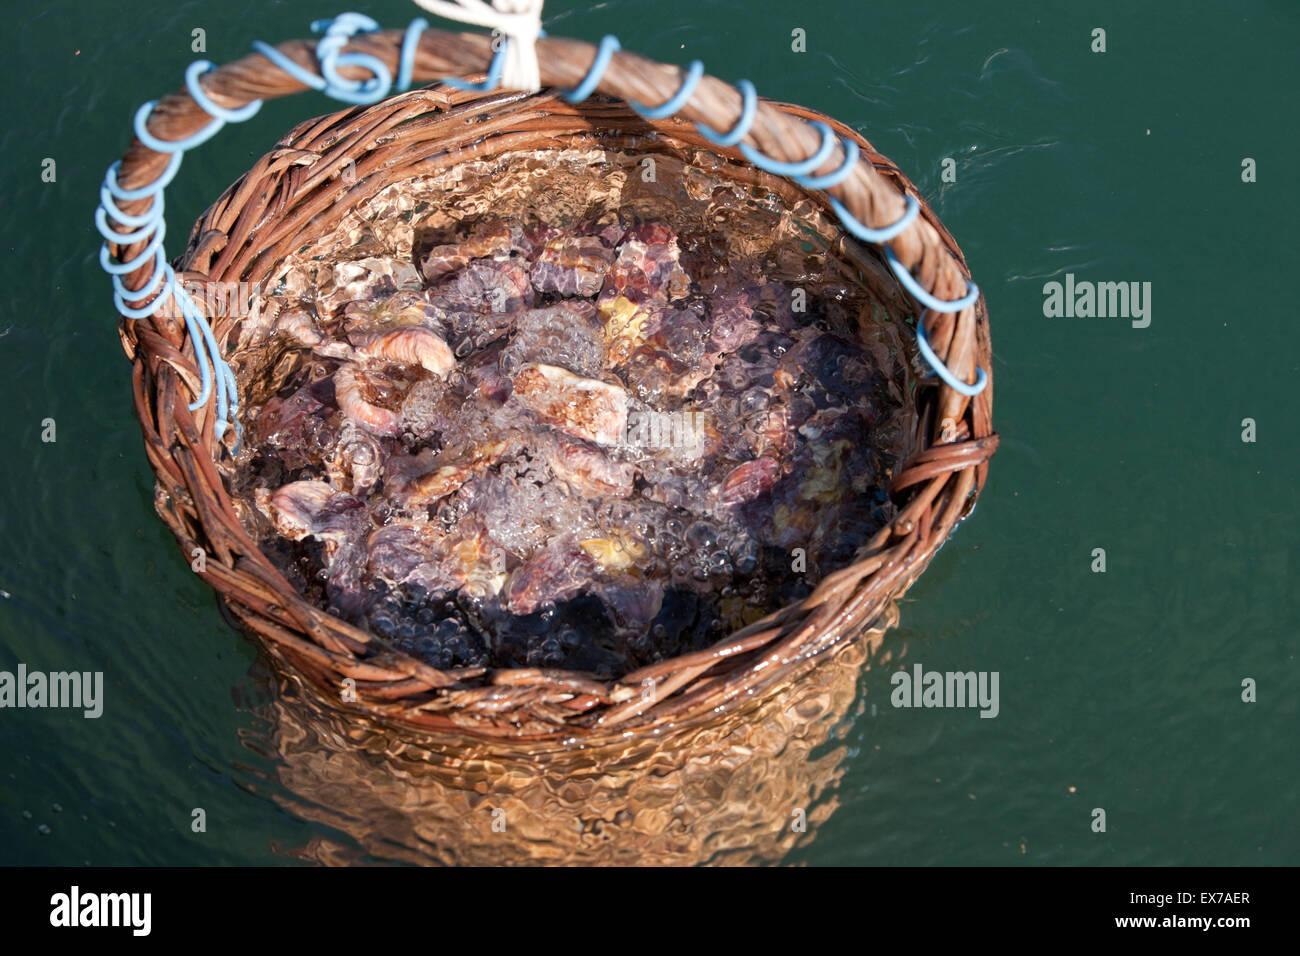 fig drying stockfotos fig drying bilder alamy. Black Bedroom Furniture Sets. Home Design Ideas